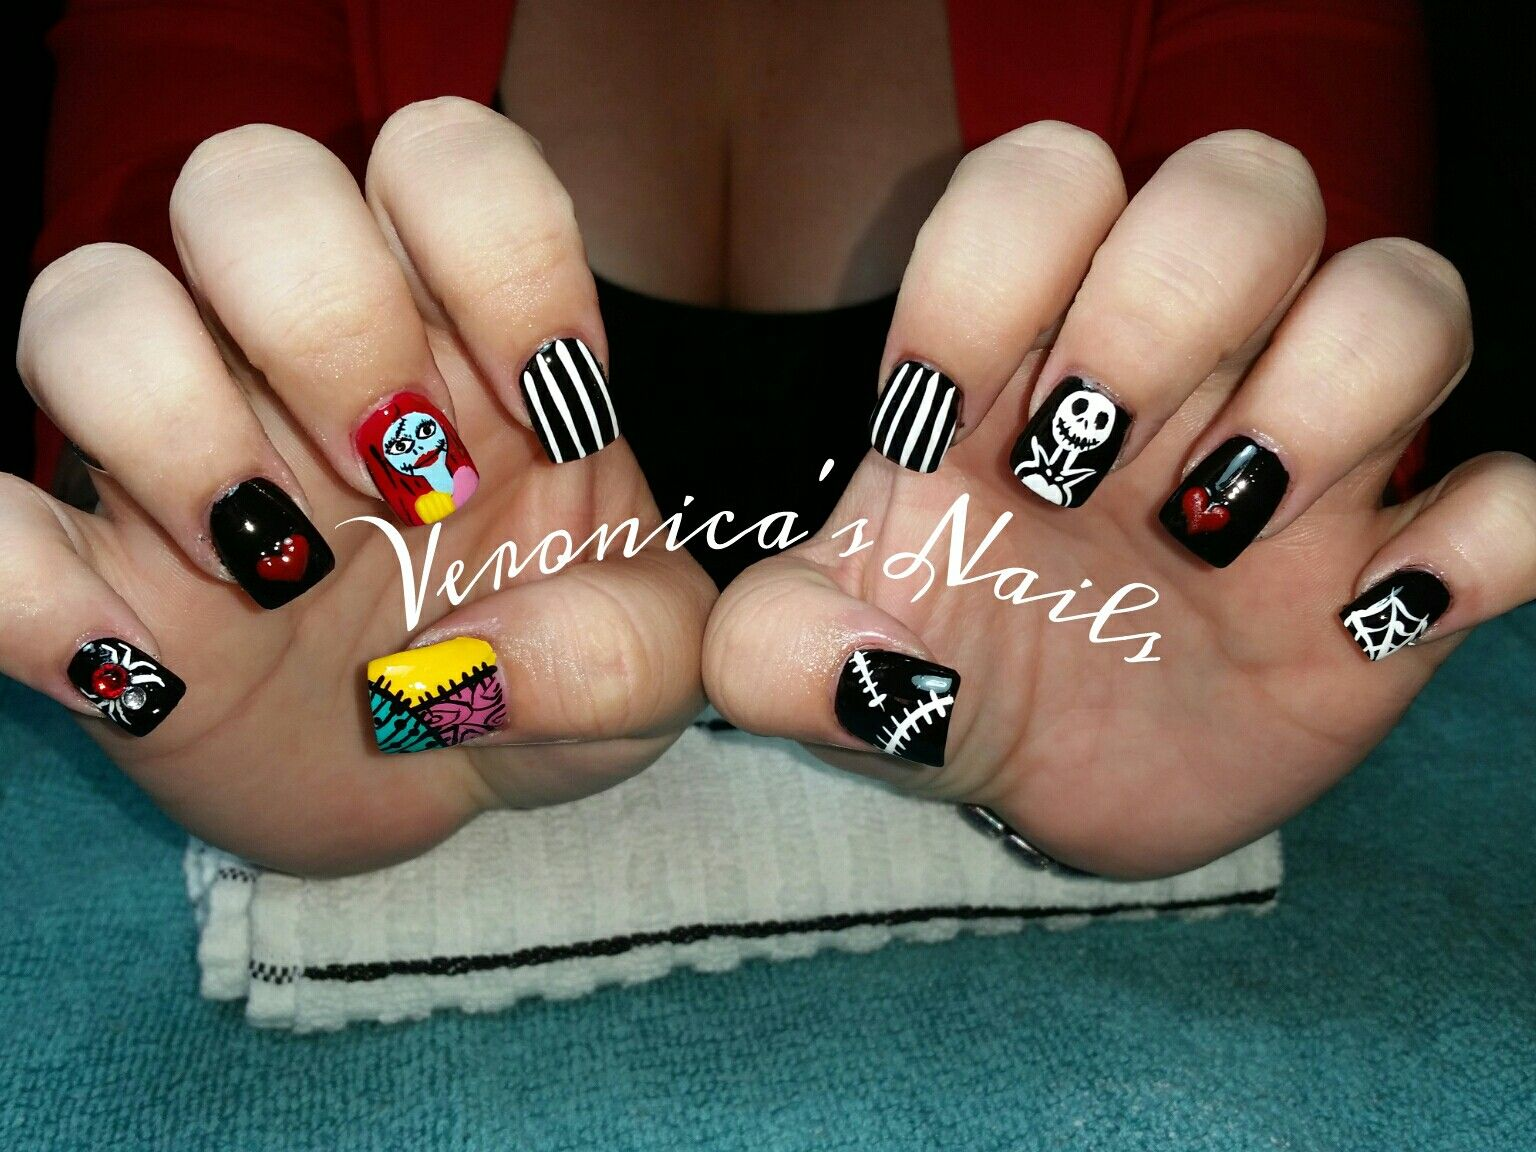 Pin by Veronica Villarreal on @nailedbyvee | Pinterest | Disney ...